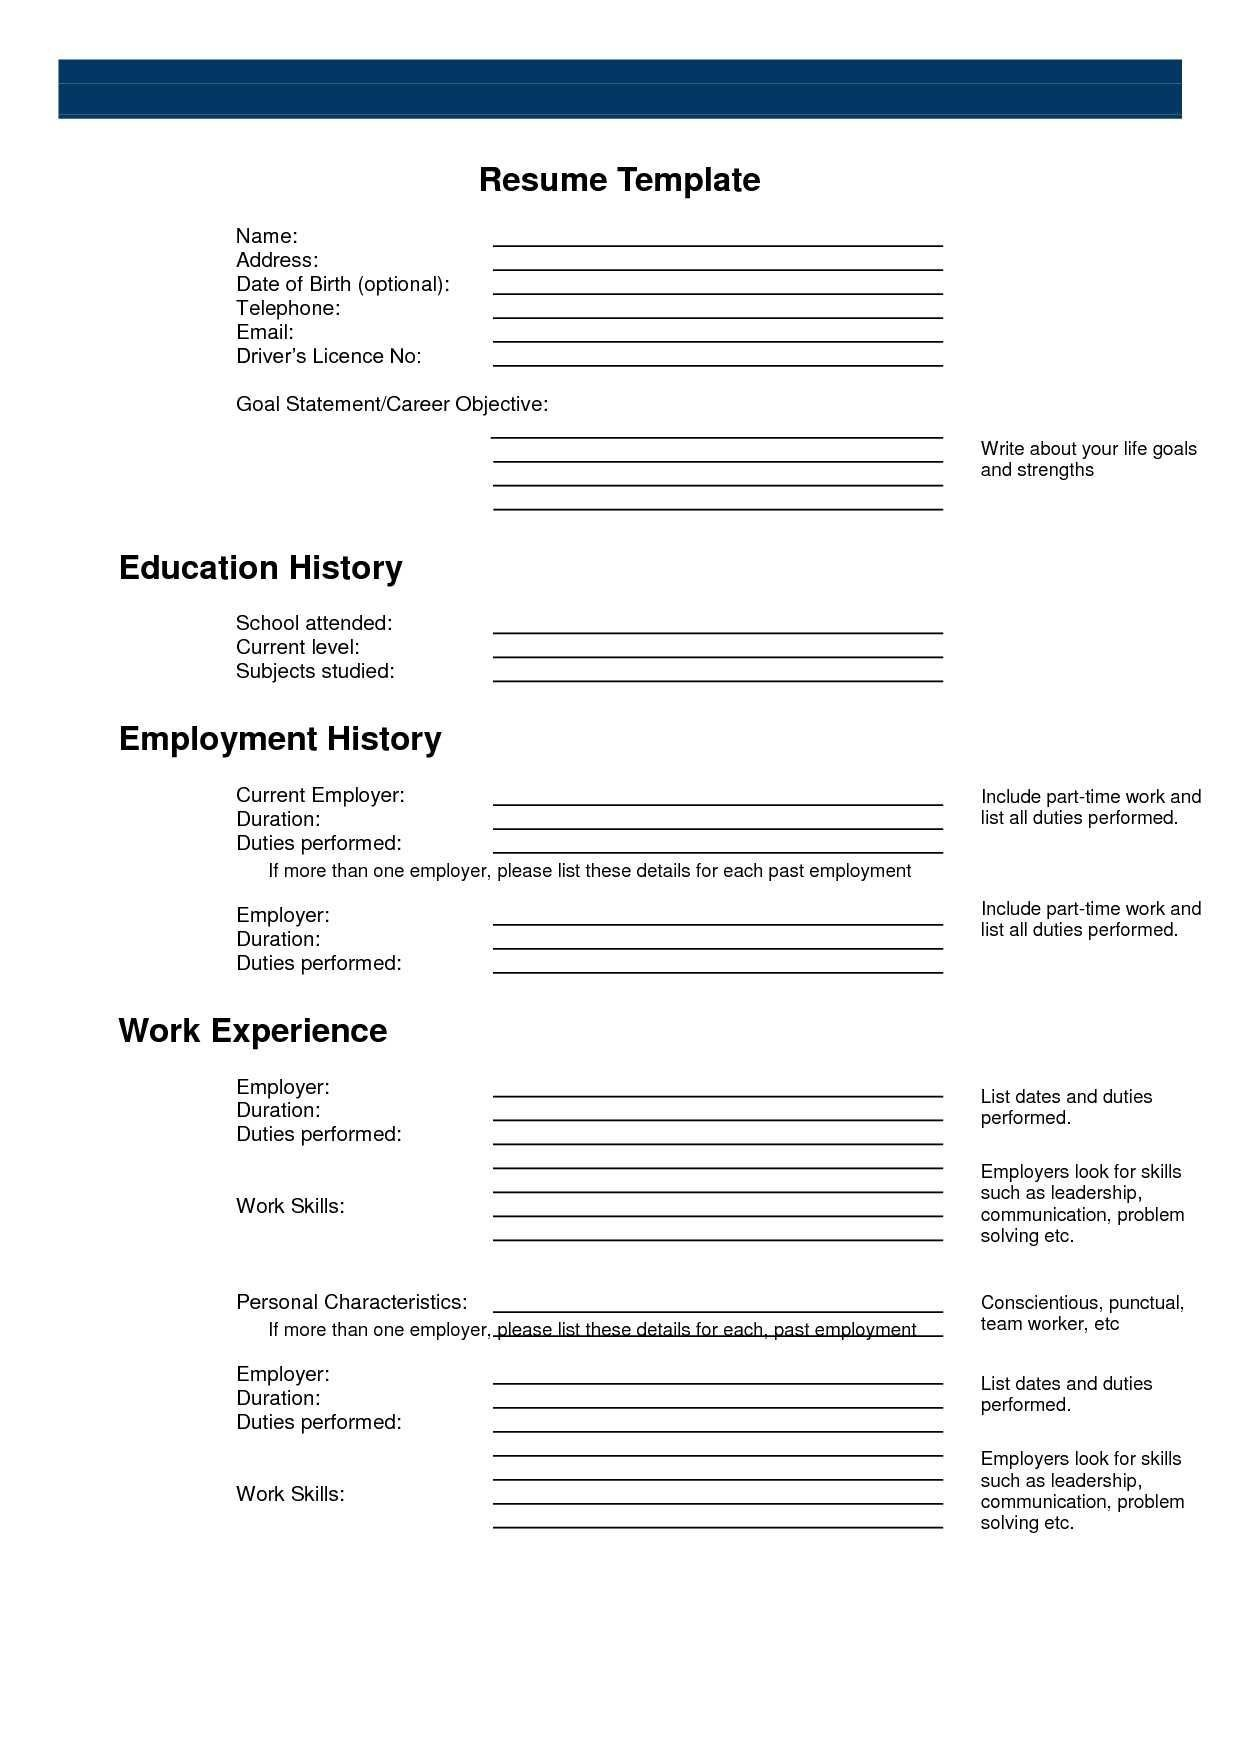 Pinanishfeds On Resumes   Free Printable Resume, Free Printable - Free Printable Professional Resume Templates